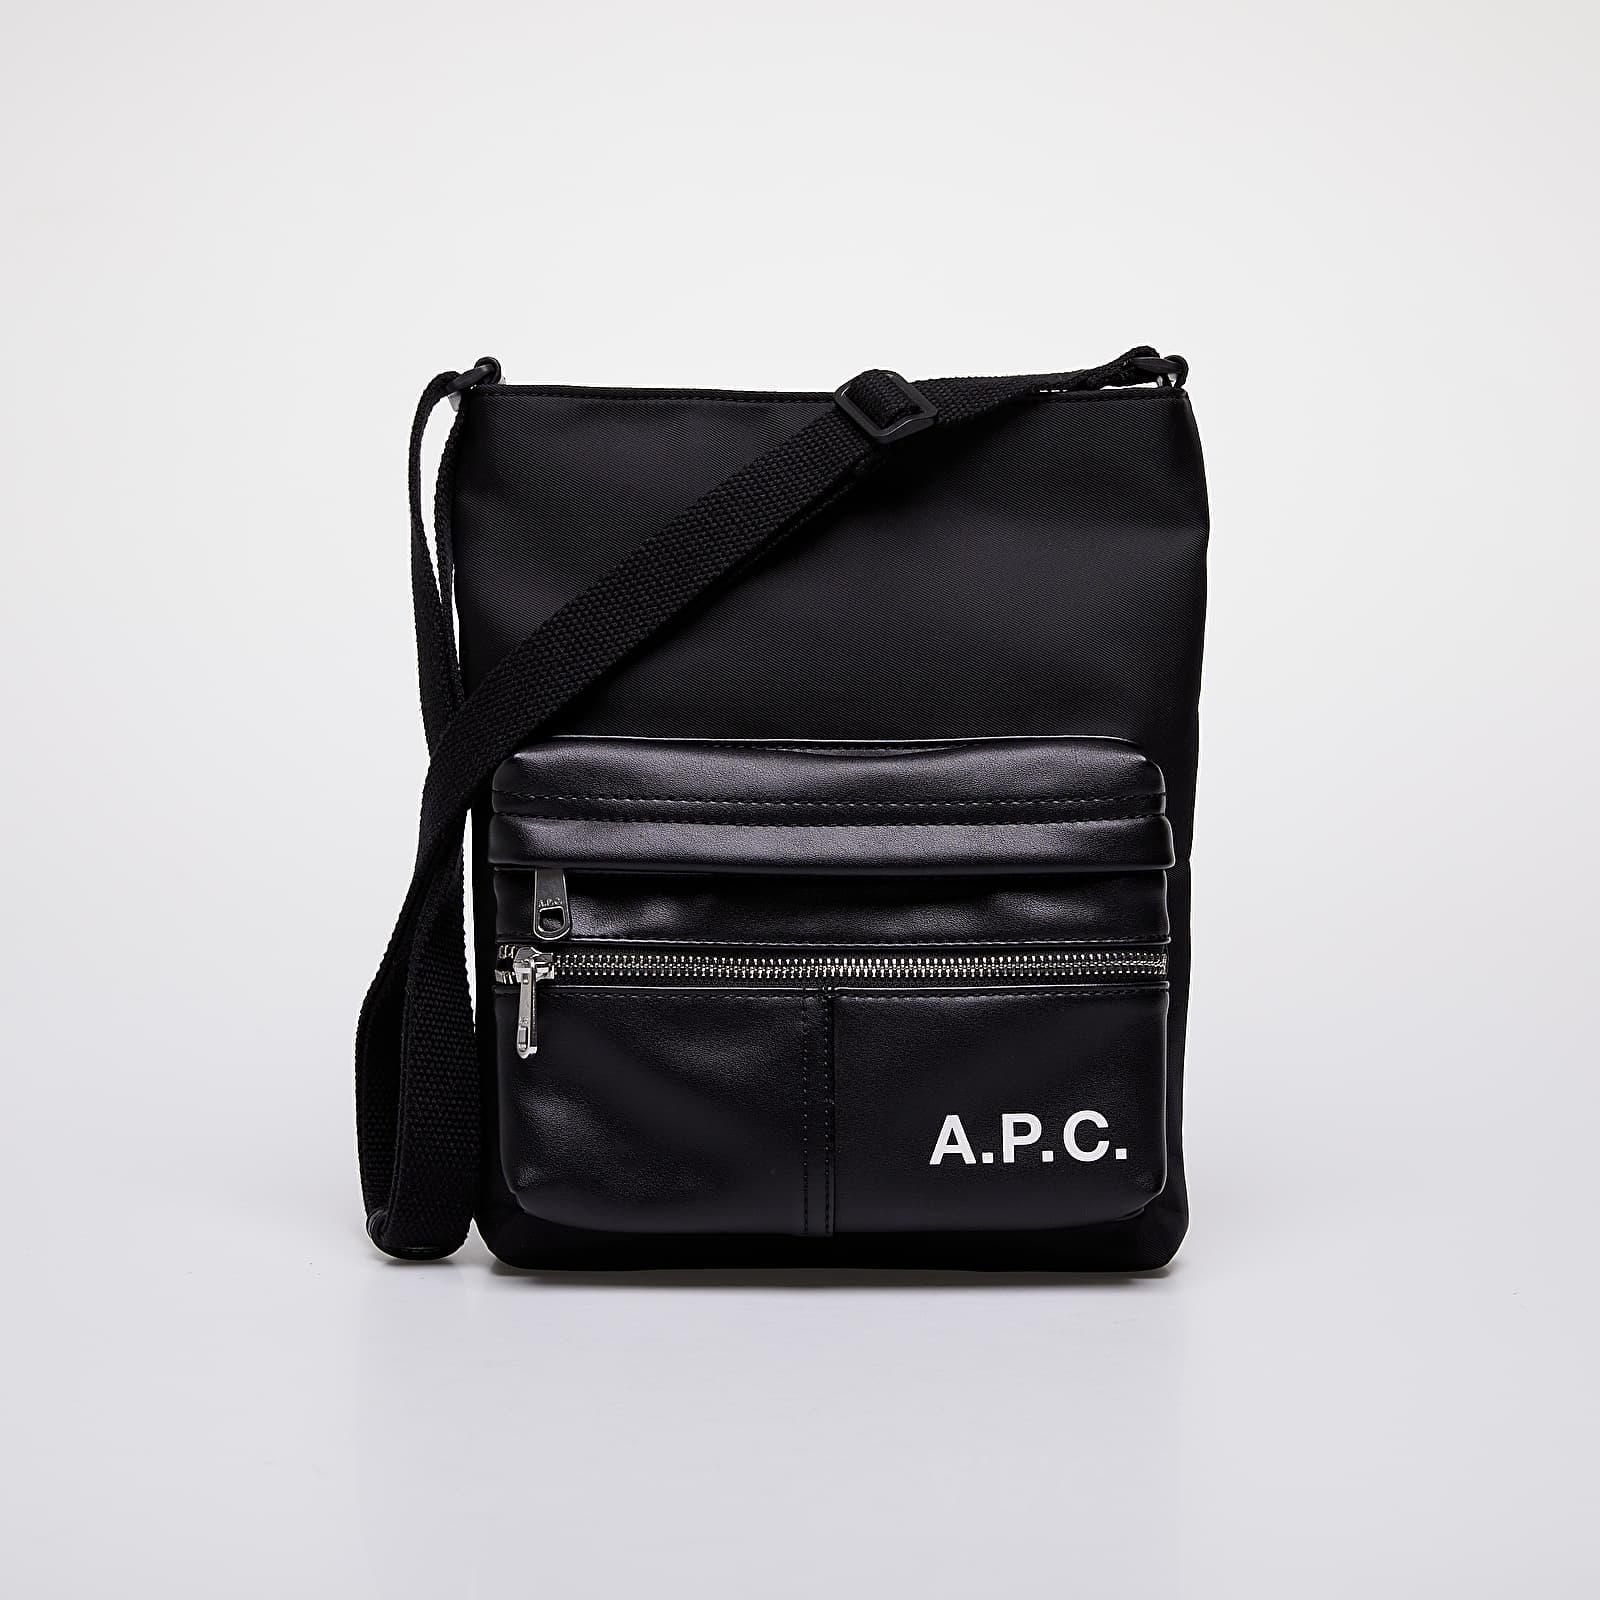 Tašky přes rameno A.P.C. Camden Sacoche Bag Black